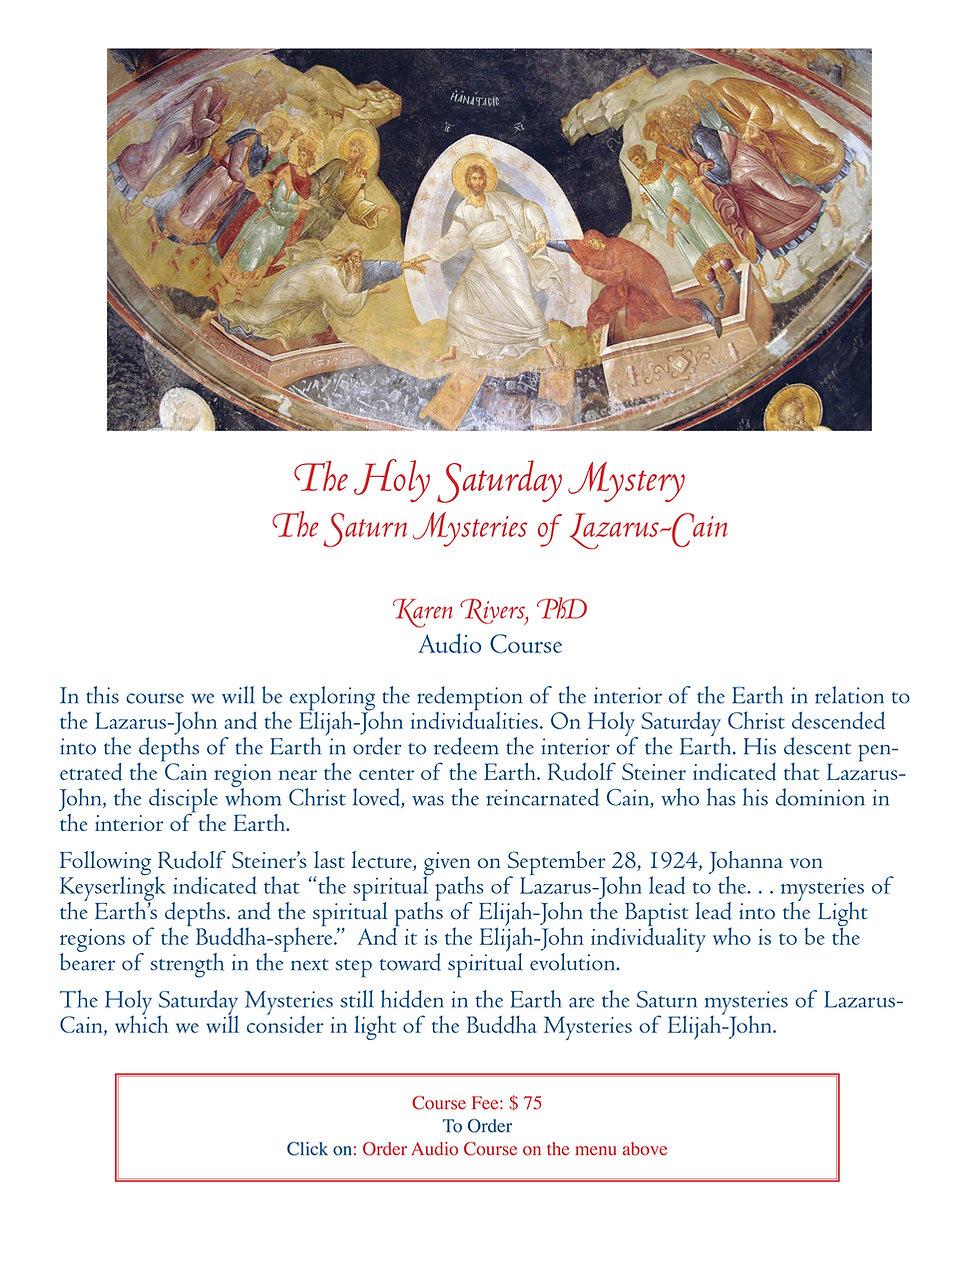 The Holy Saturday Mystery audio.jpg